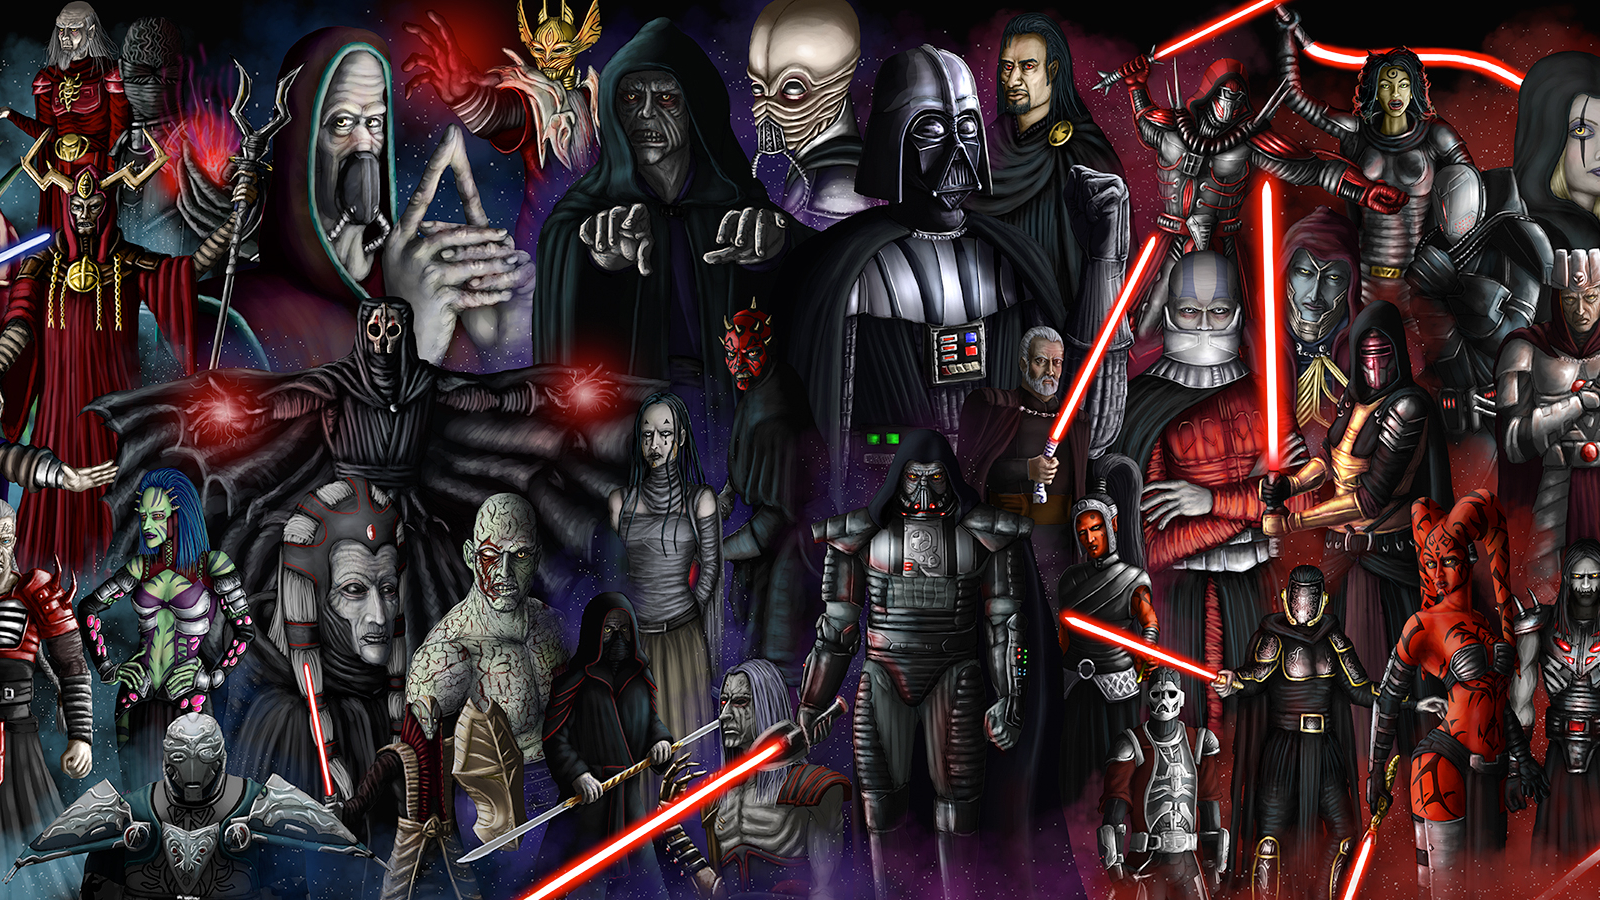 Sith Lord Wallpaper Star Wars Lords 2330x900